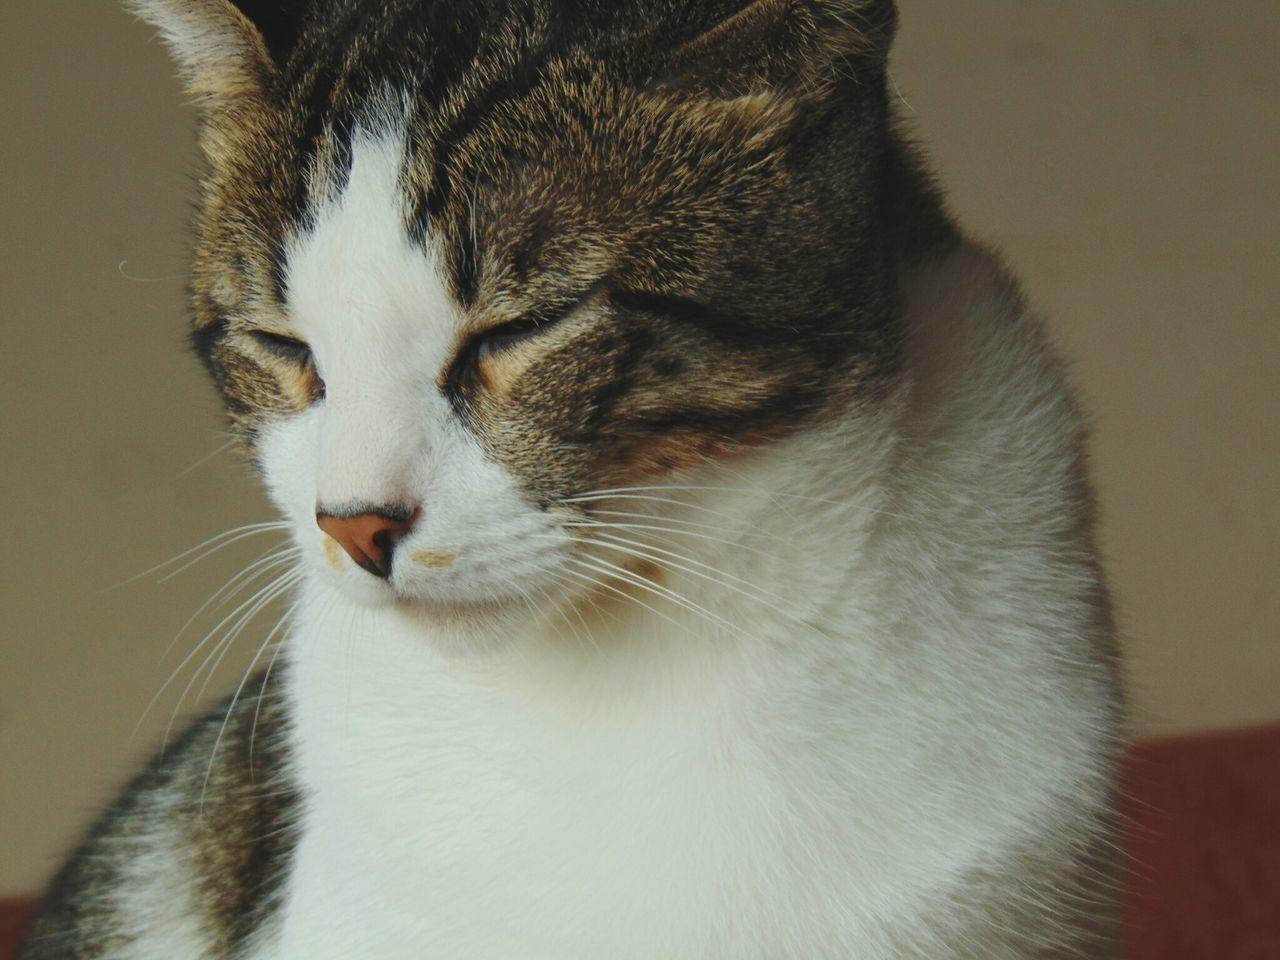 Nice Photo Kevin Photography Cat♡ Jolie❤ Sr Kevin Feline El Gordo Cat Gatito♥ Pets Sleeping Cat Domestic Cat Domestic Animals One Animal Animal Themes Mammal Indoors  Whisker Portrait No People Close-up Day